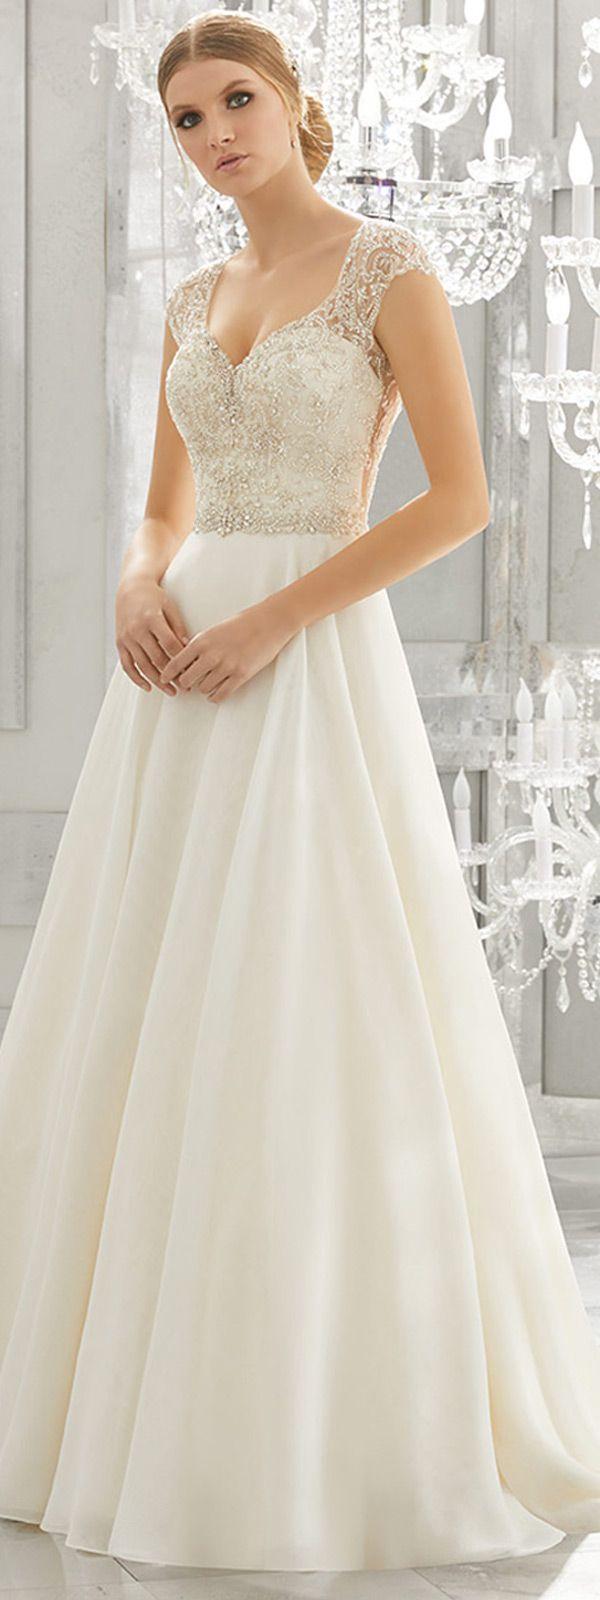 Mori Lee Bridesmaids Dresses Best for Bride - oukas.info